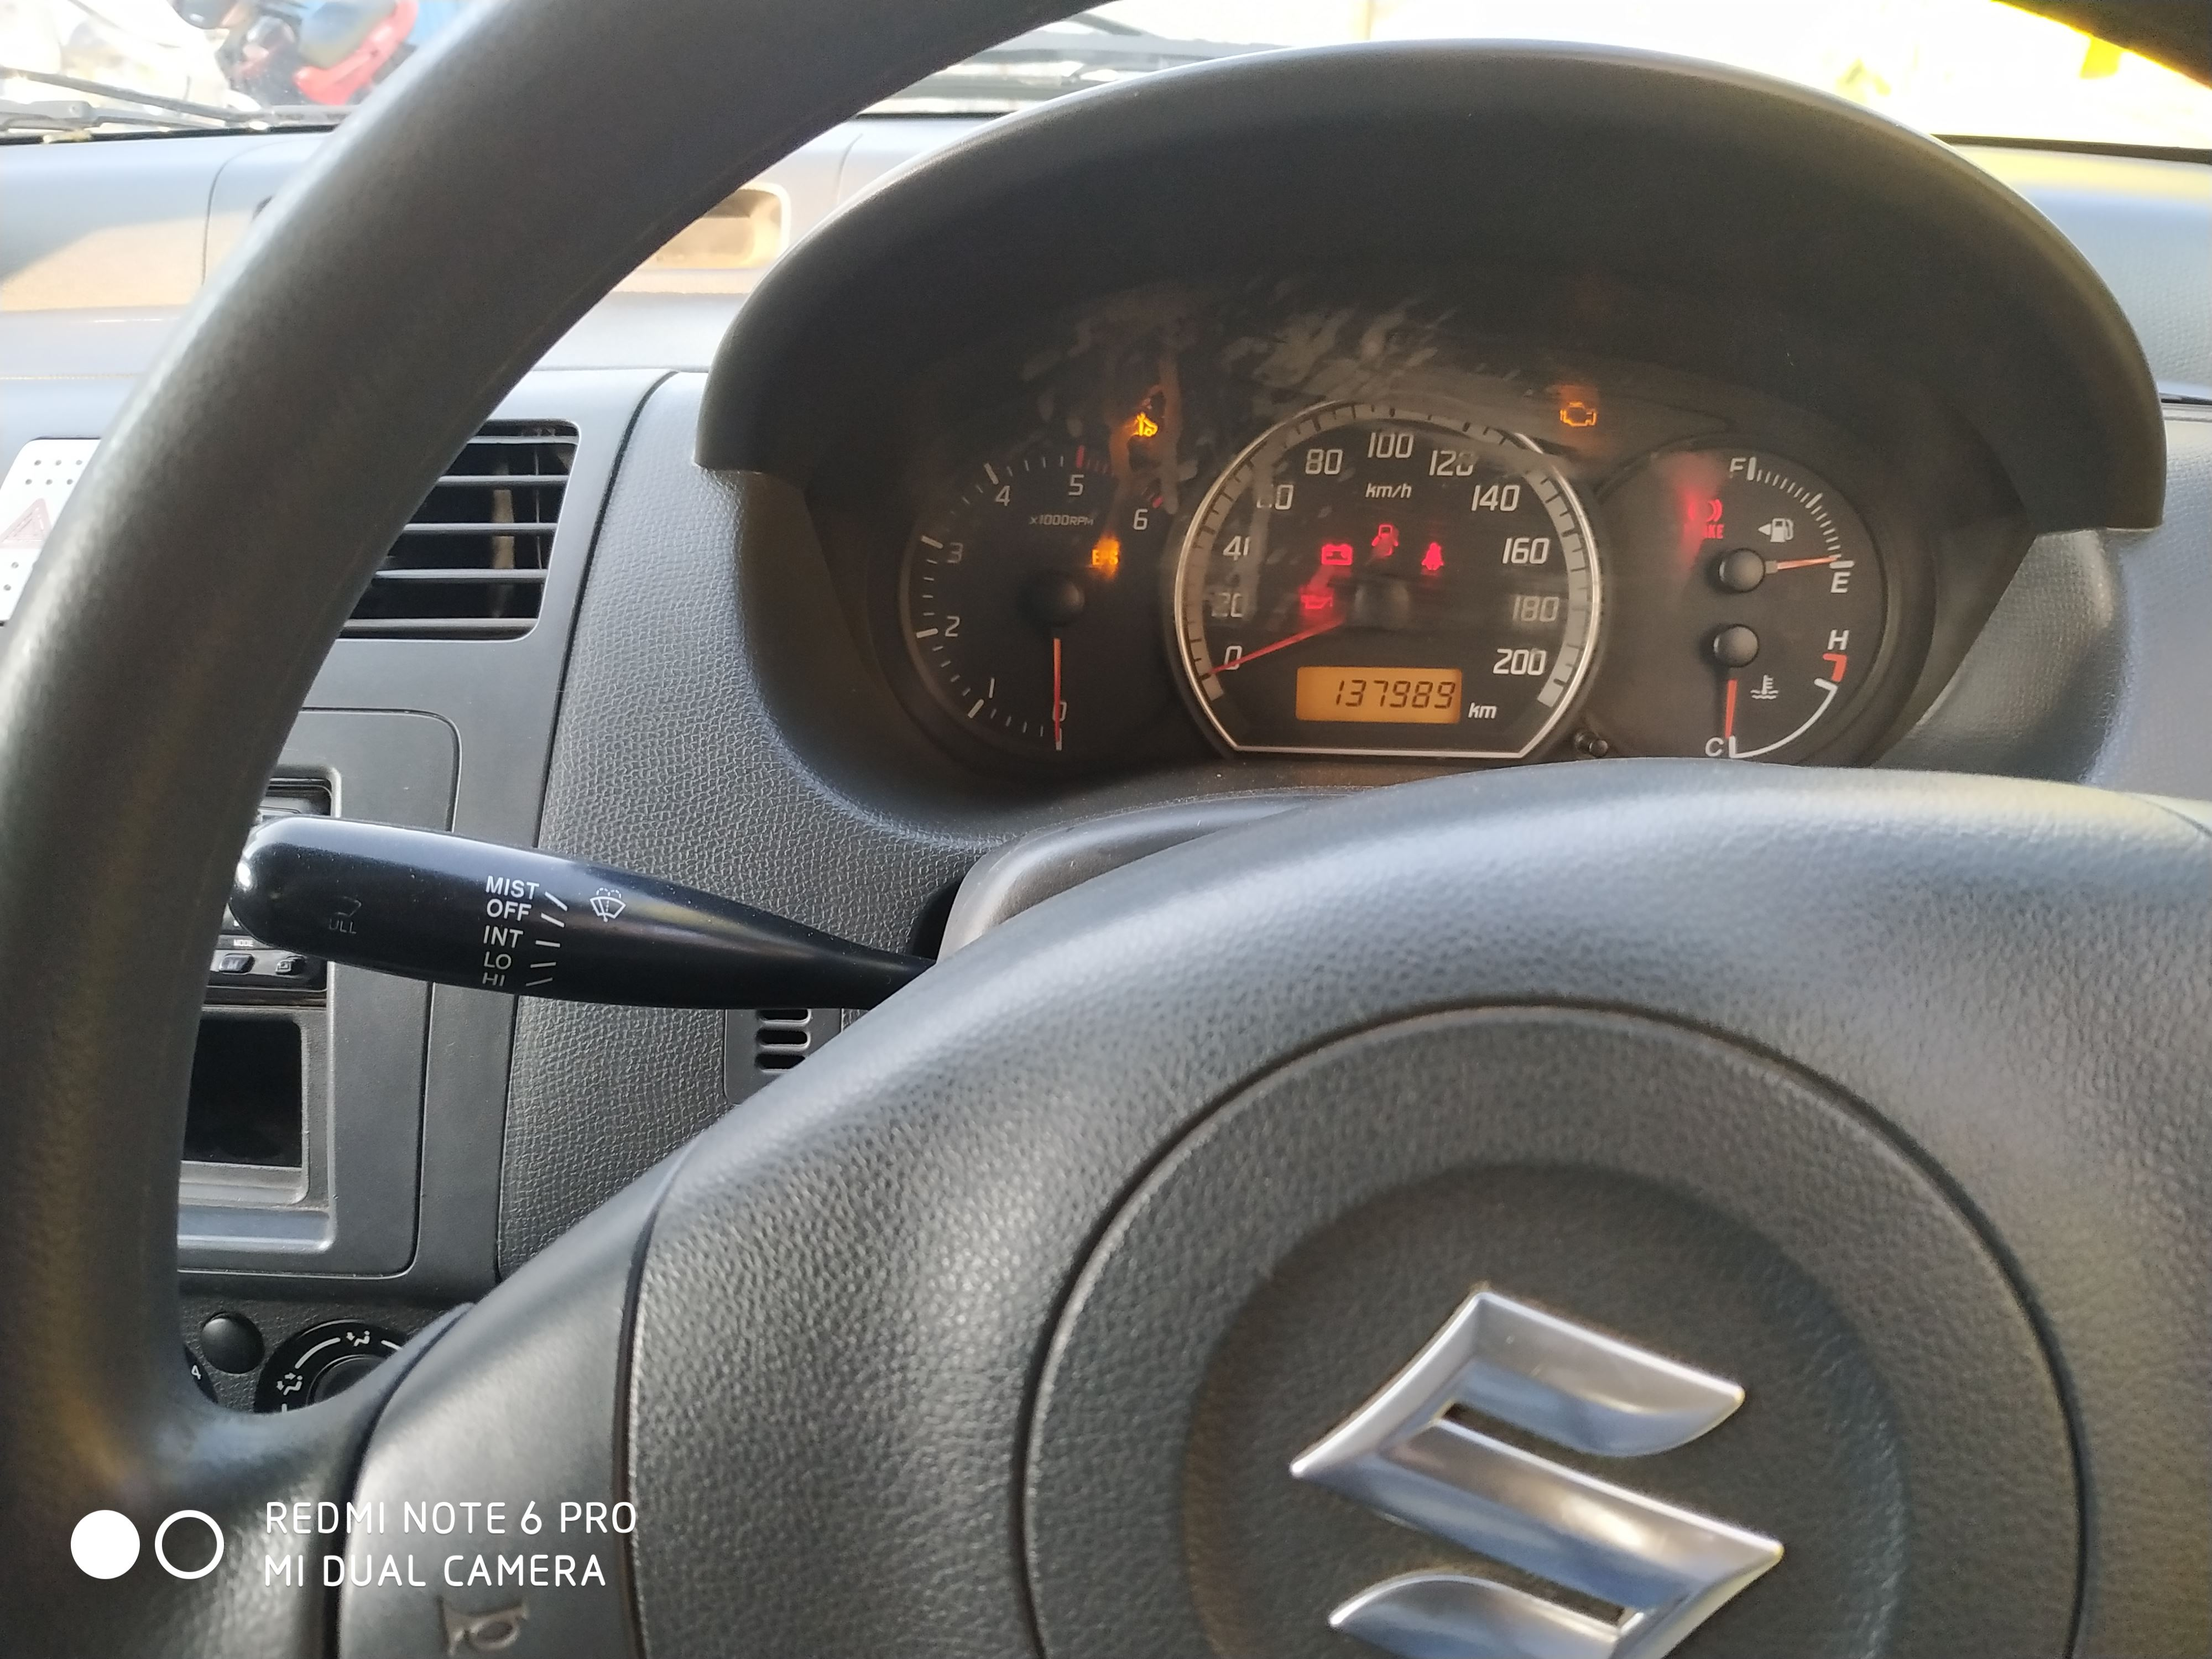 Maruti Suzuki Swift Vdi Mahindra First Choice